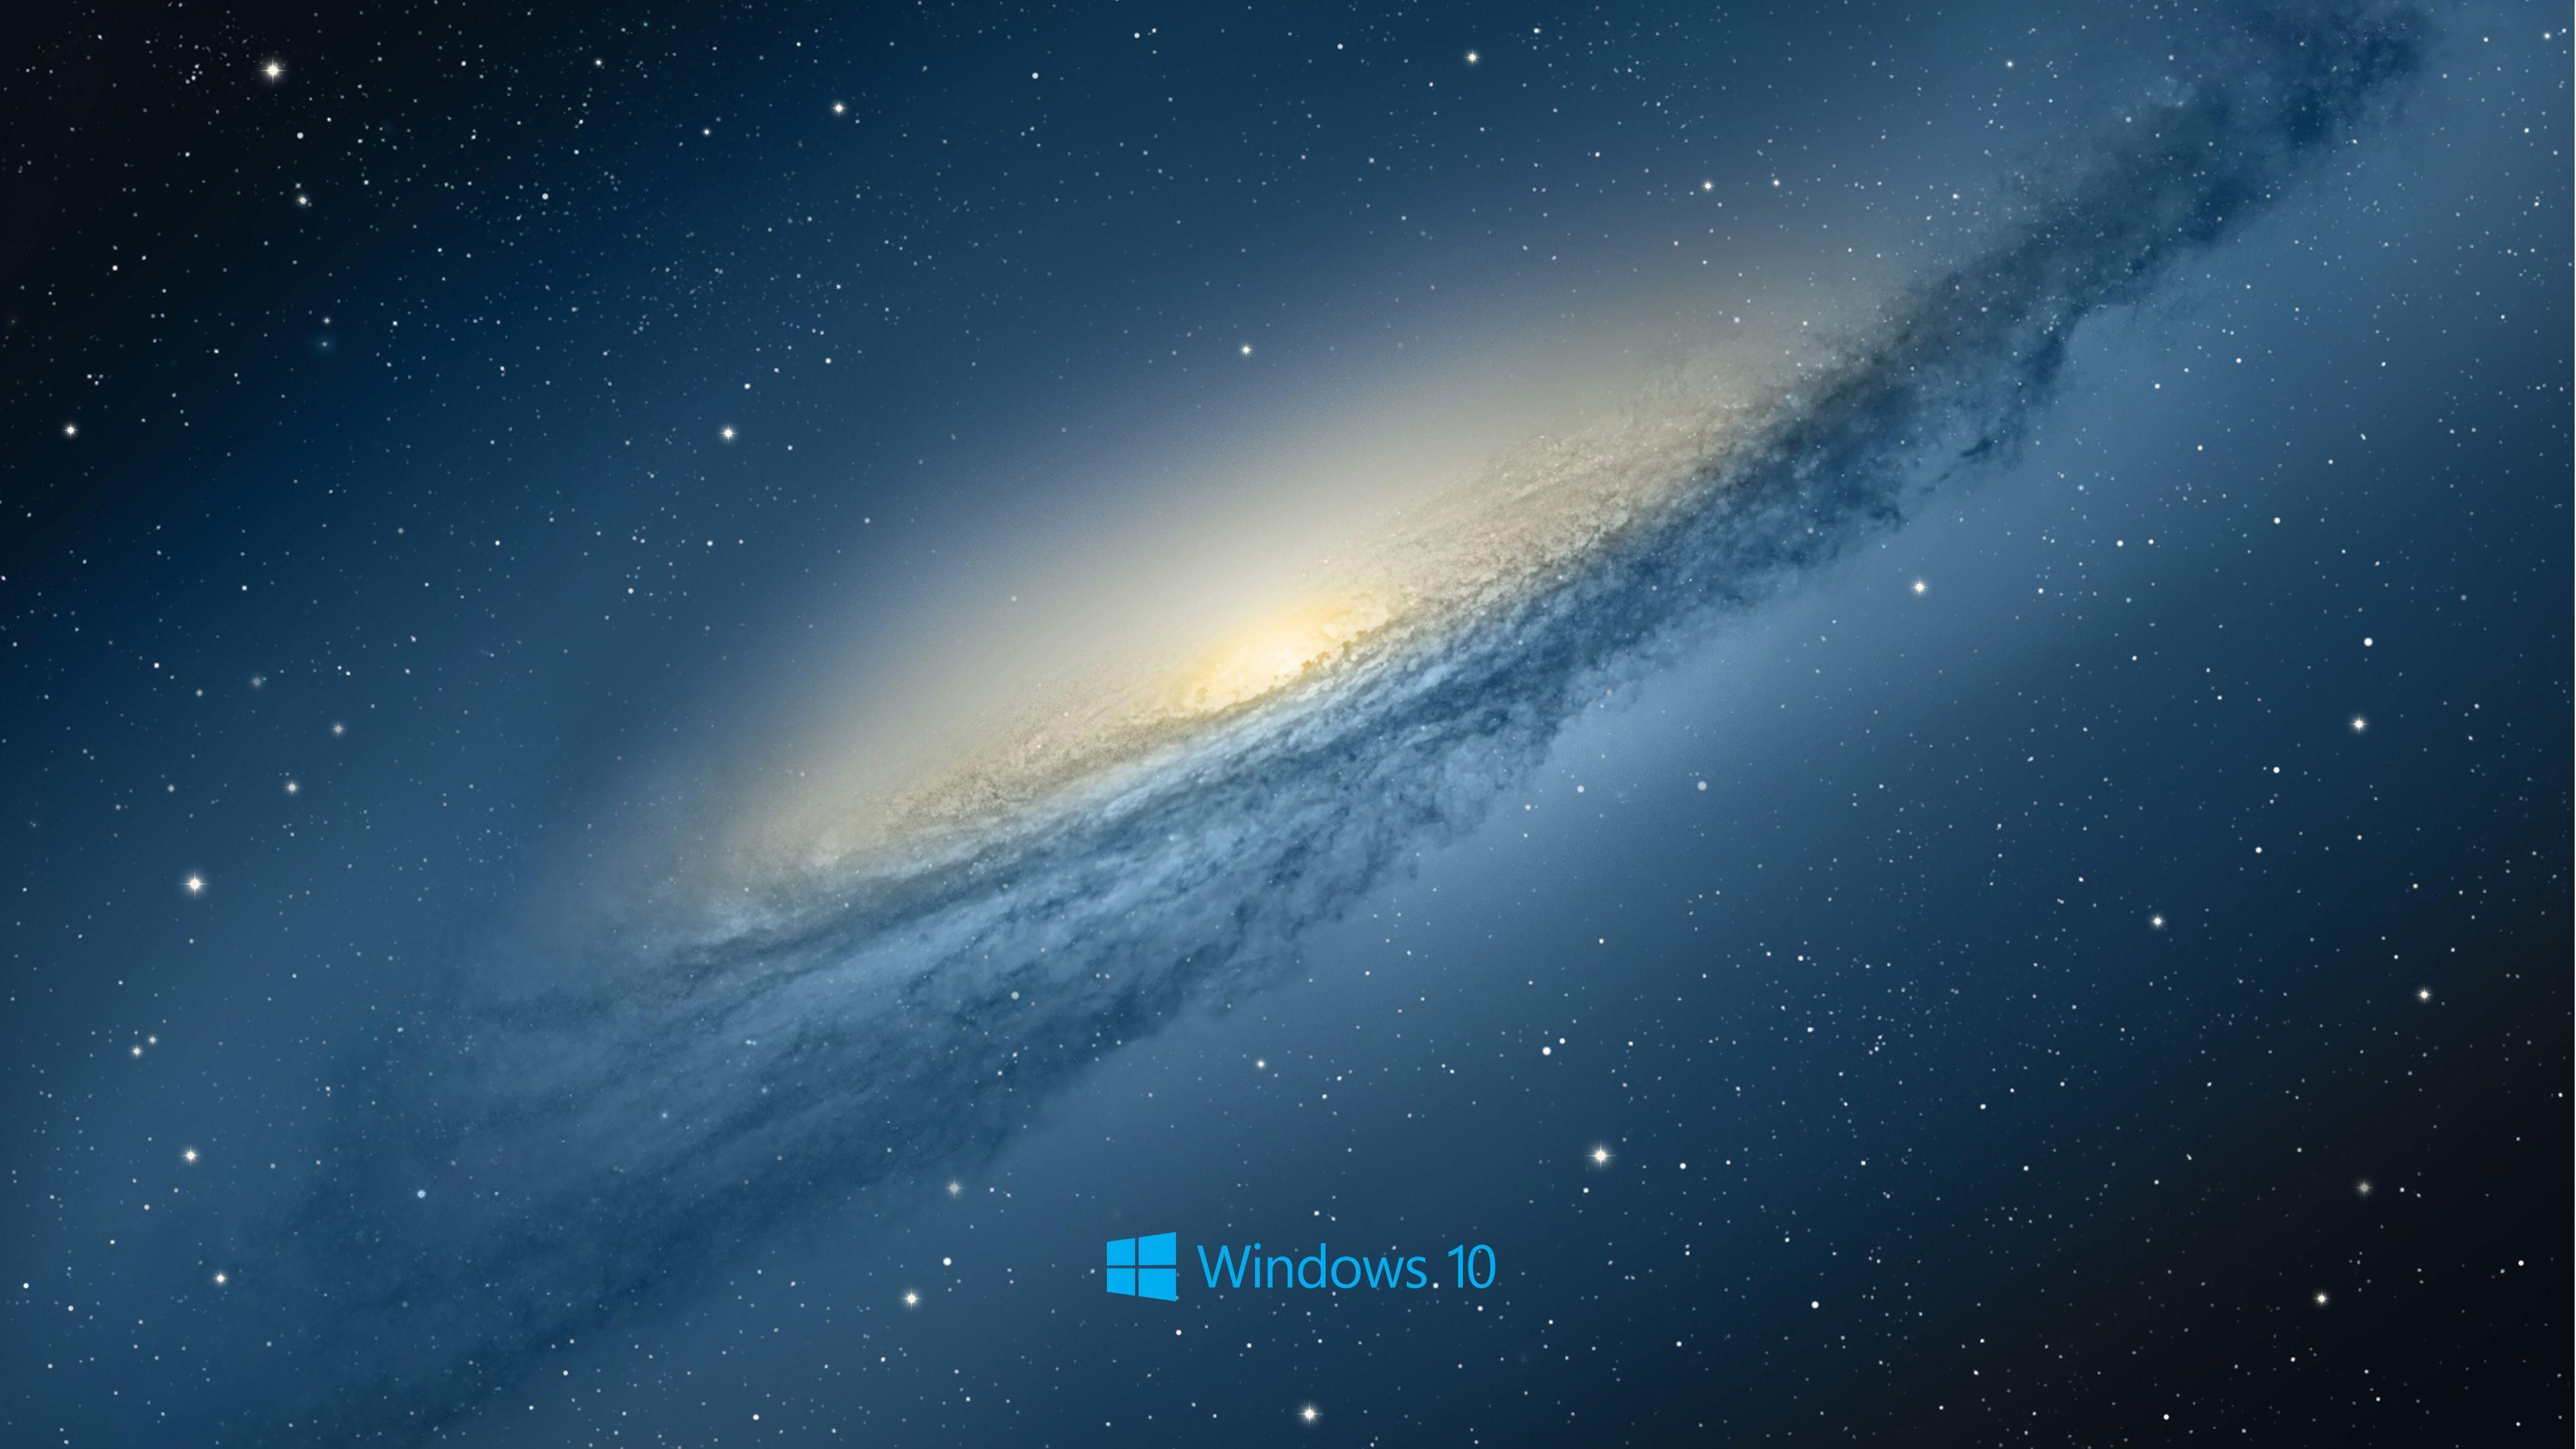 Sfondi desktop hp windows 10